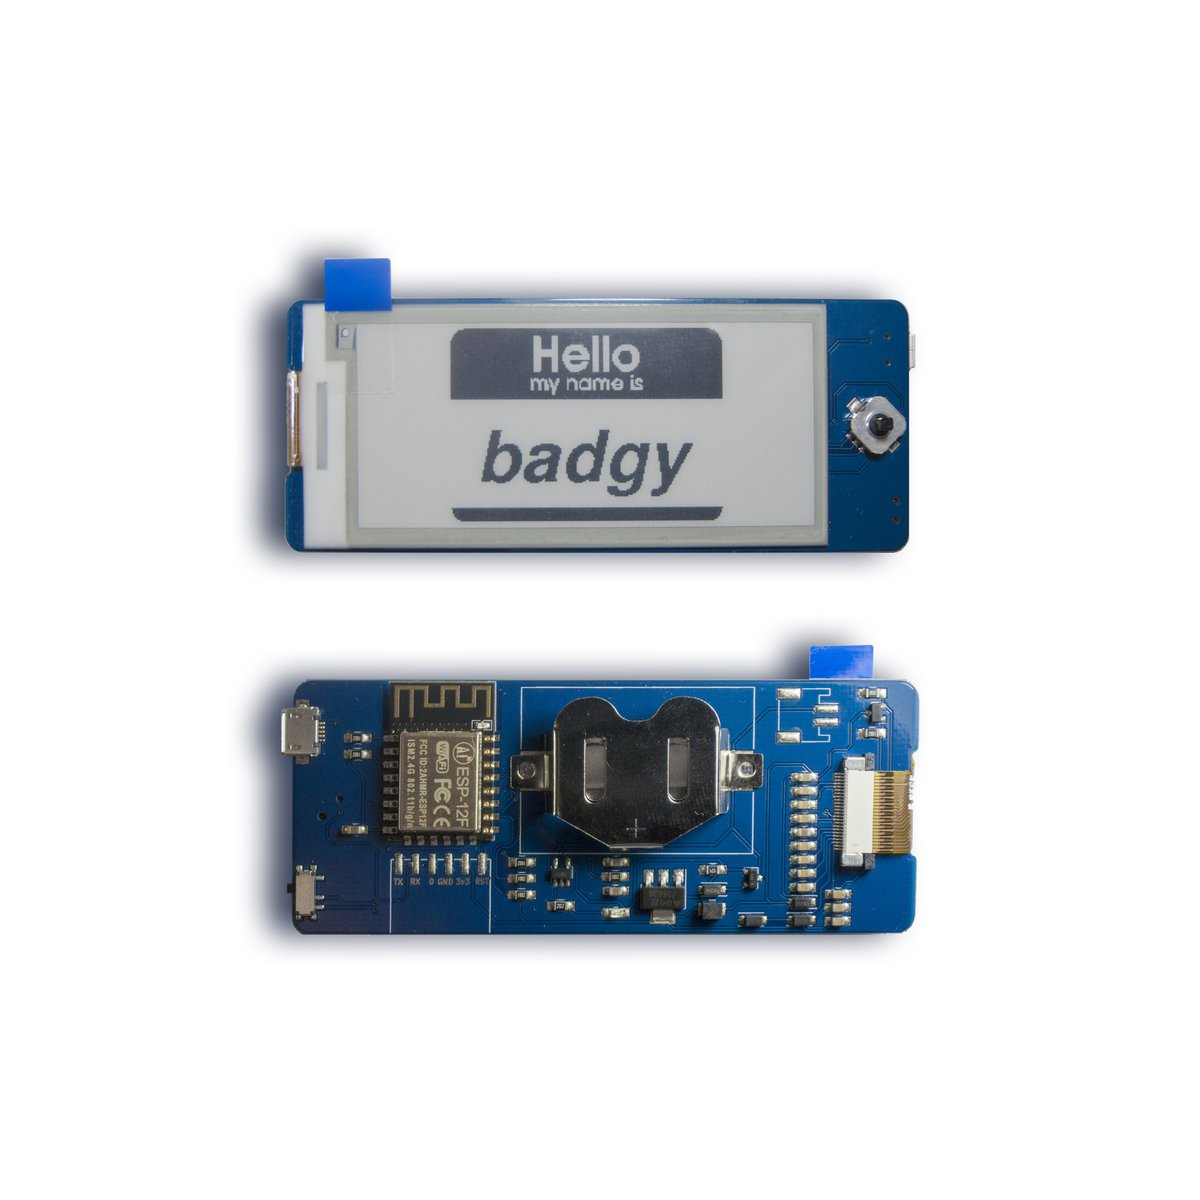 Badgy - IoT Badge from Squaro Engineering on Tindie